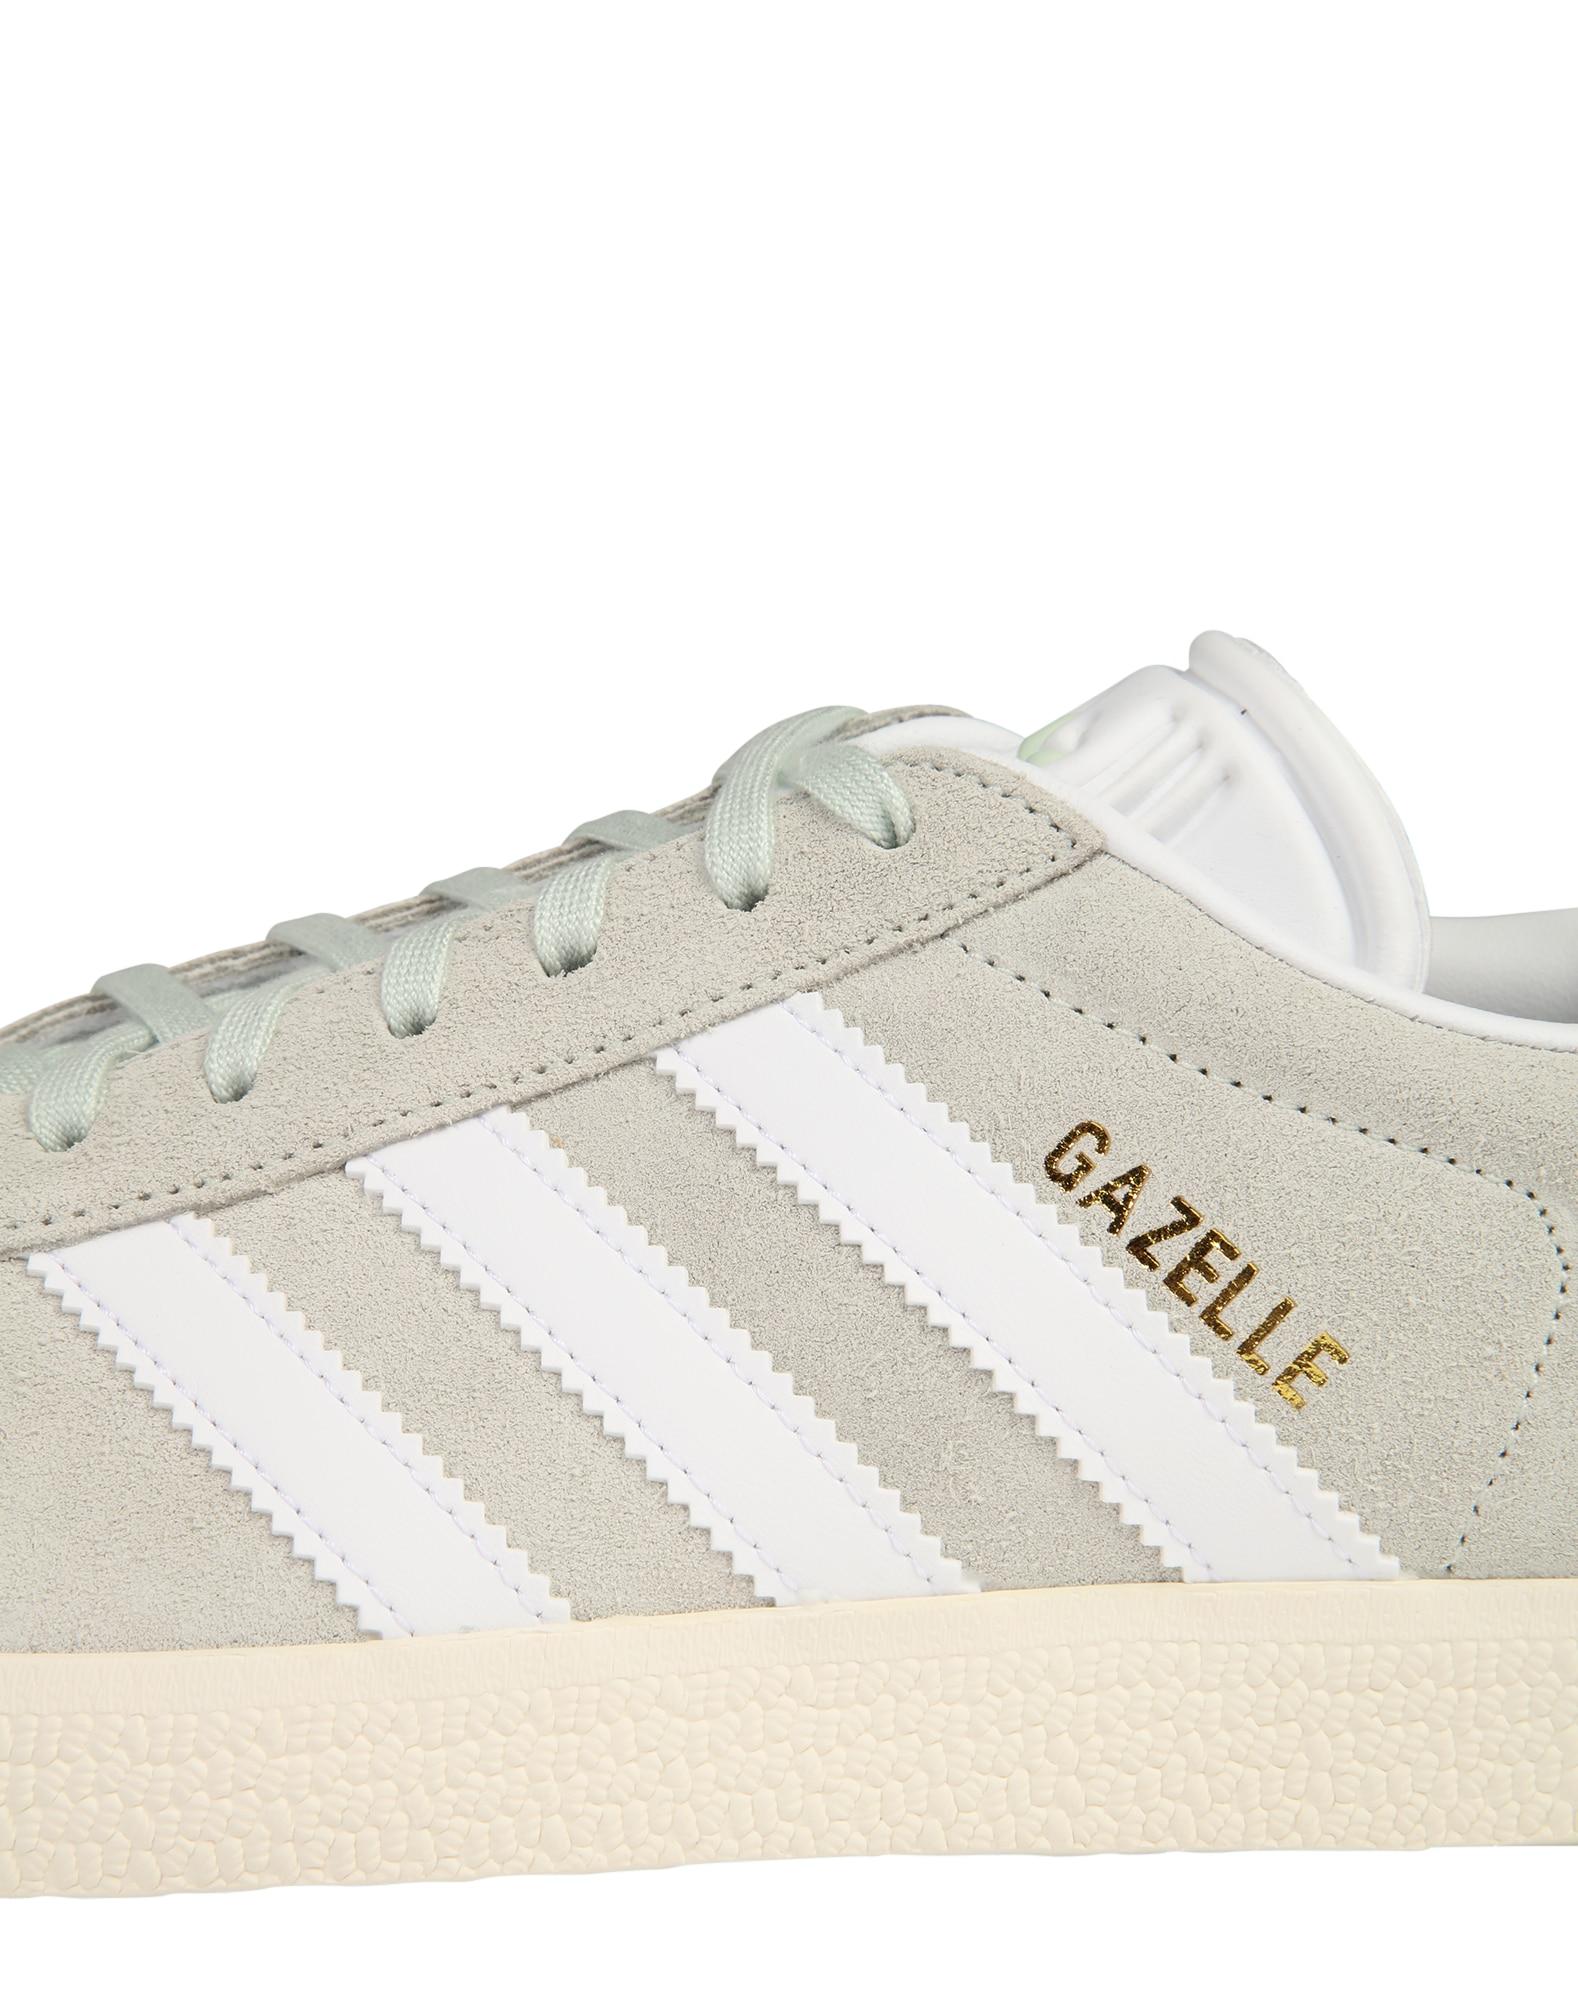 2067c006d78496 Gazelle Originals Adidas Adidas Sneakers Originals UTwqFZn